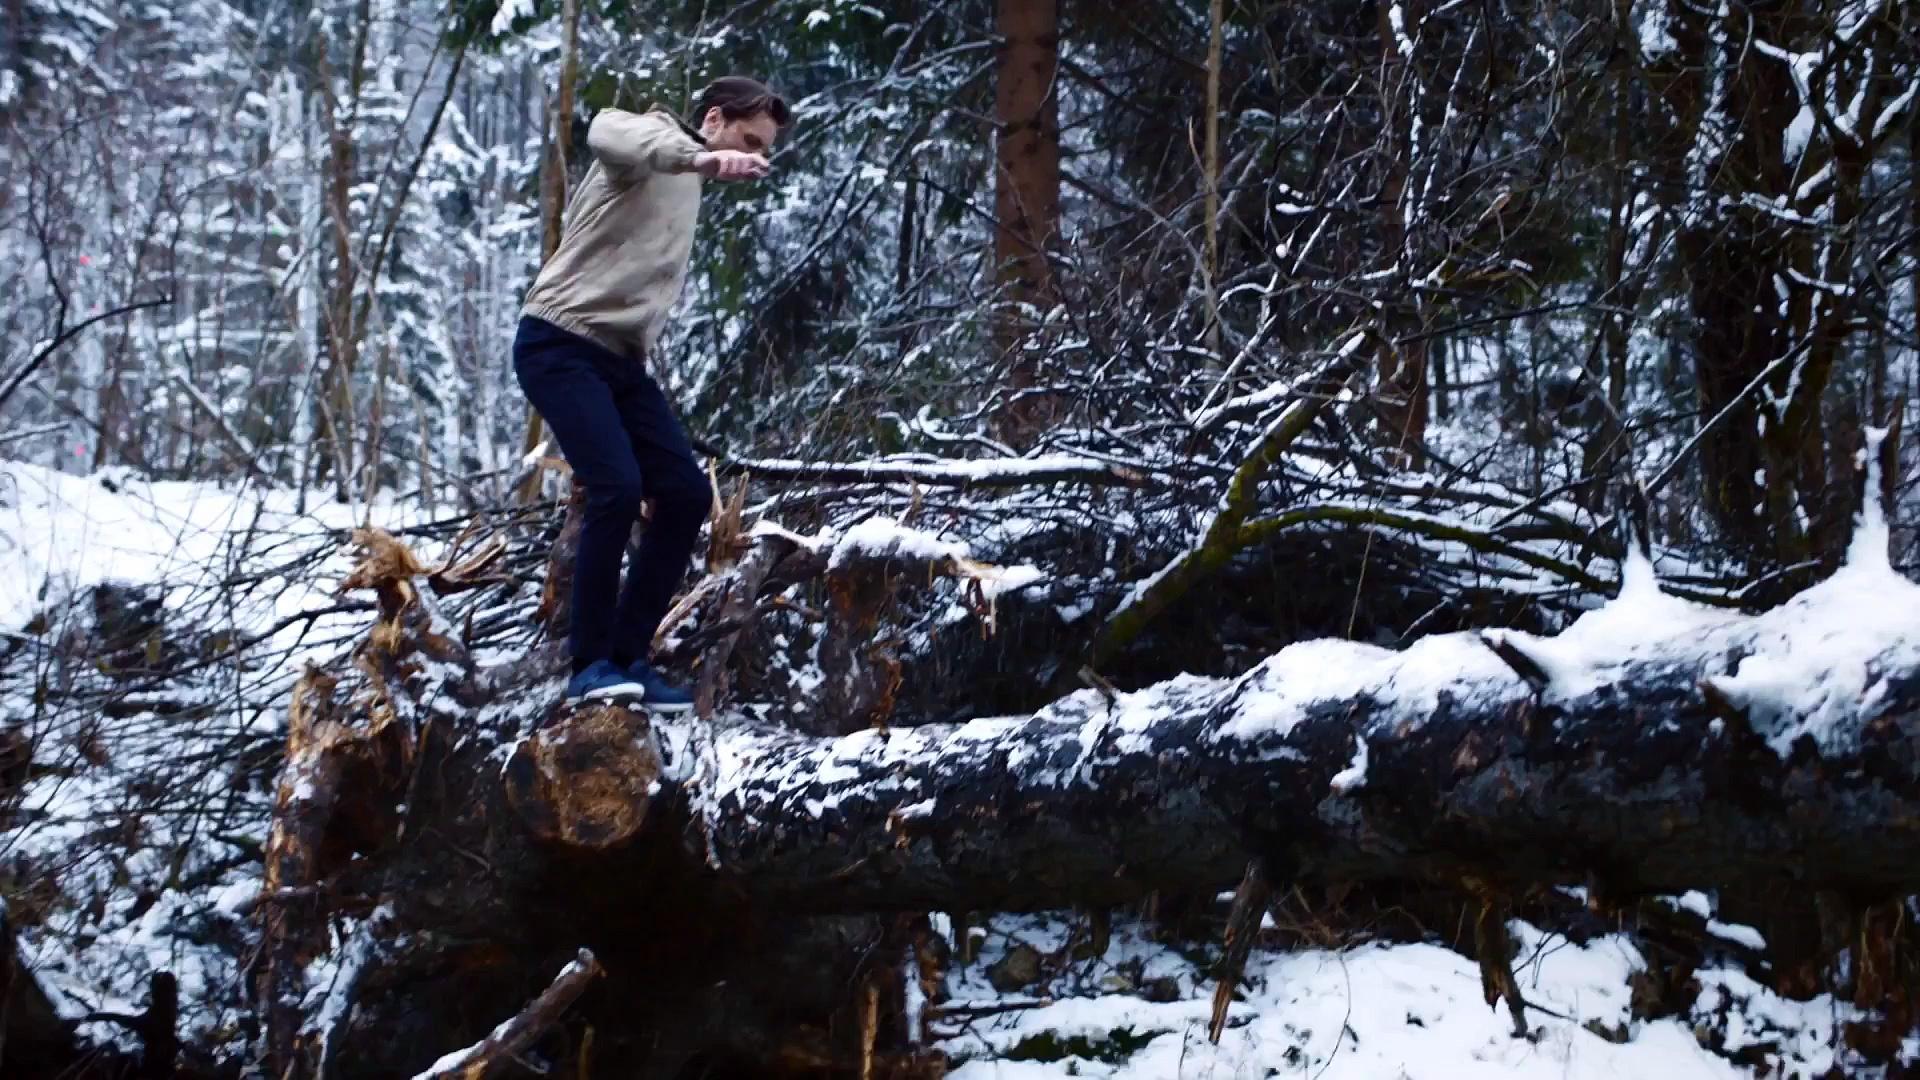 Pub de Mcdo – Le tronc d'arbre